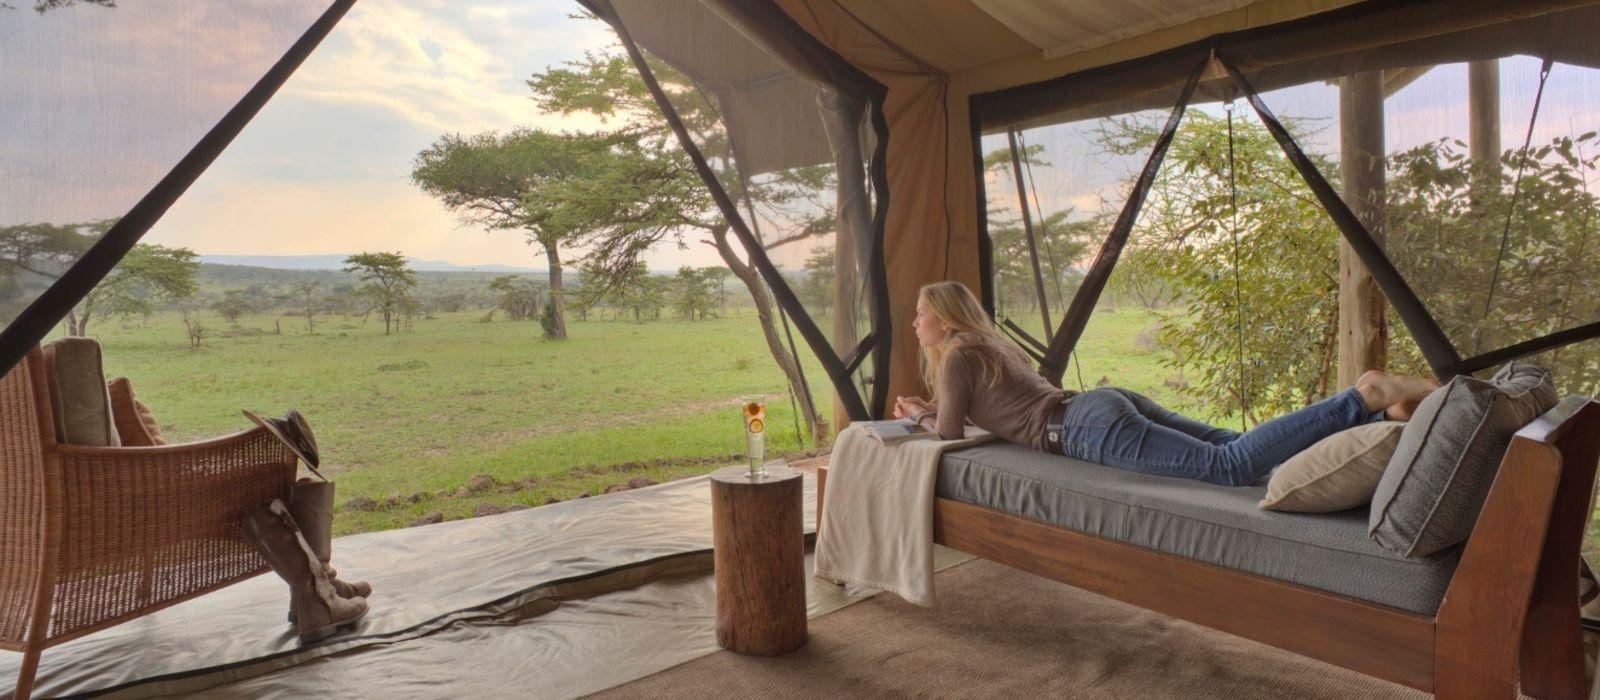 Kenia: Masai Mara, Wandersafaris & Traumstrände Urlaub 7